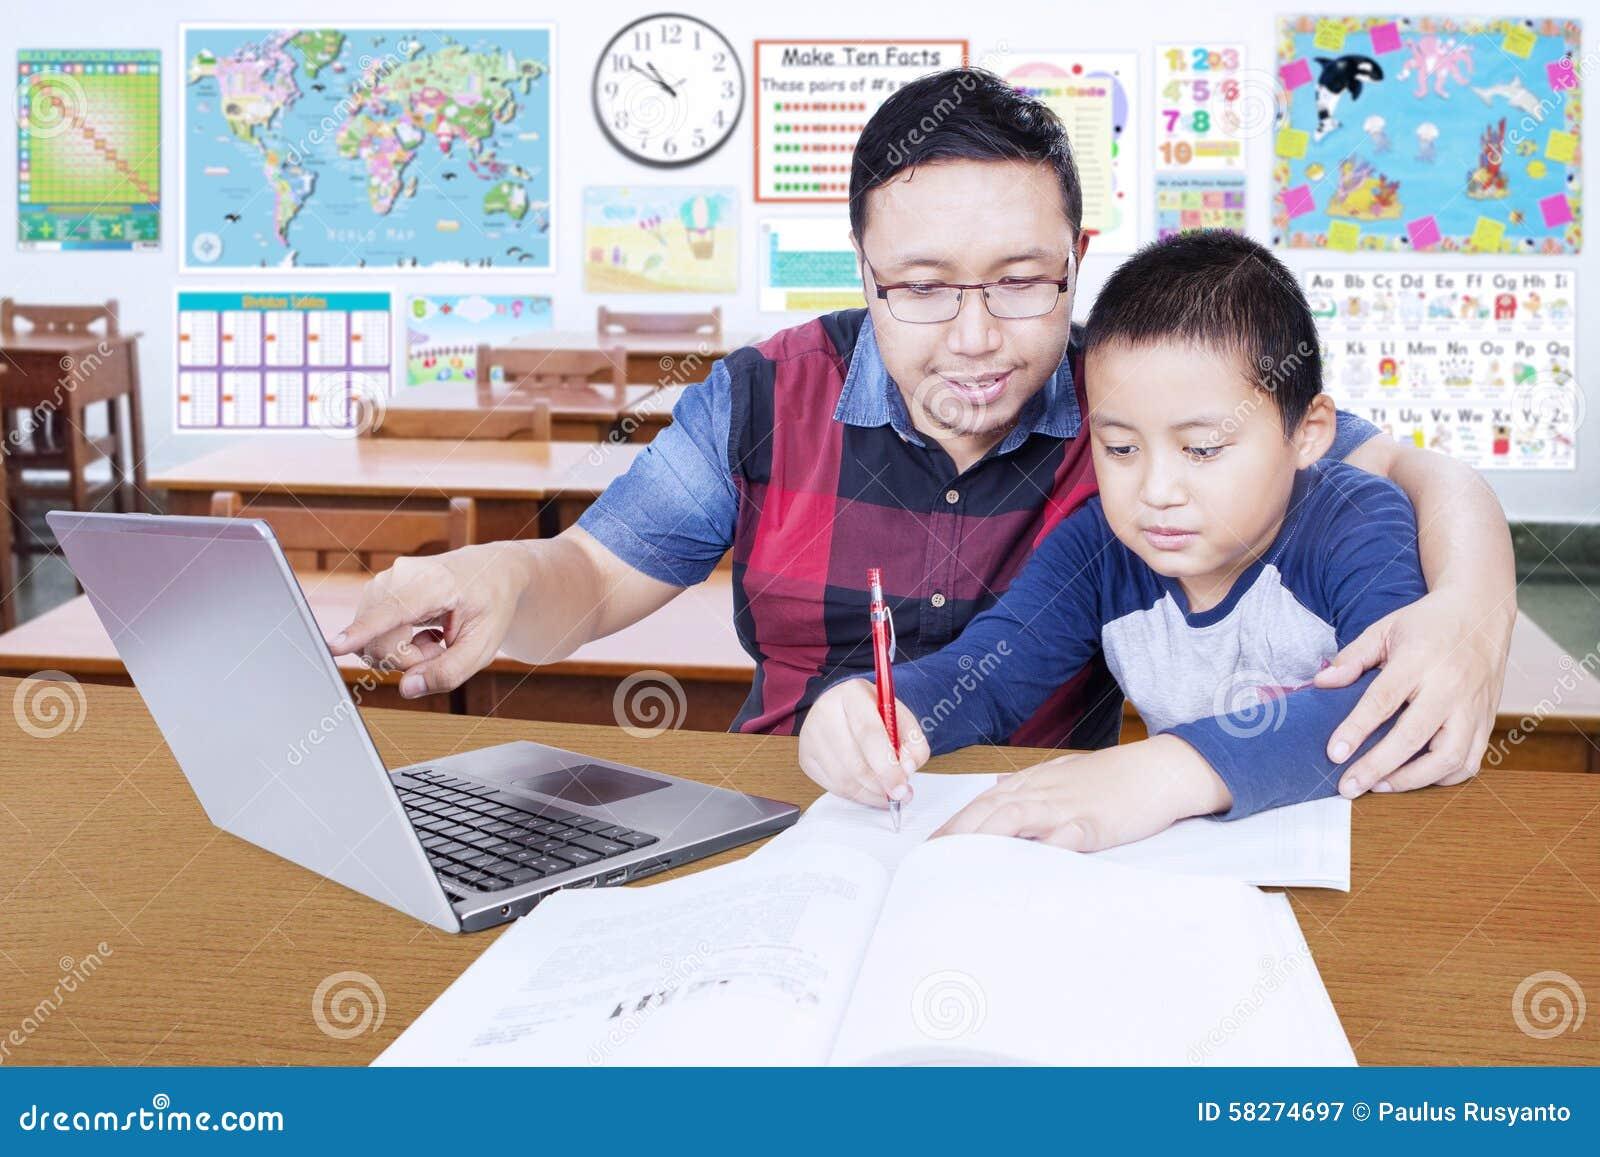 Junger Lehrer Führt Seinen Studenten, Um Zu Lernen Stockbild - Bild ...